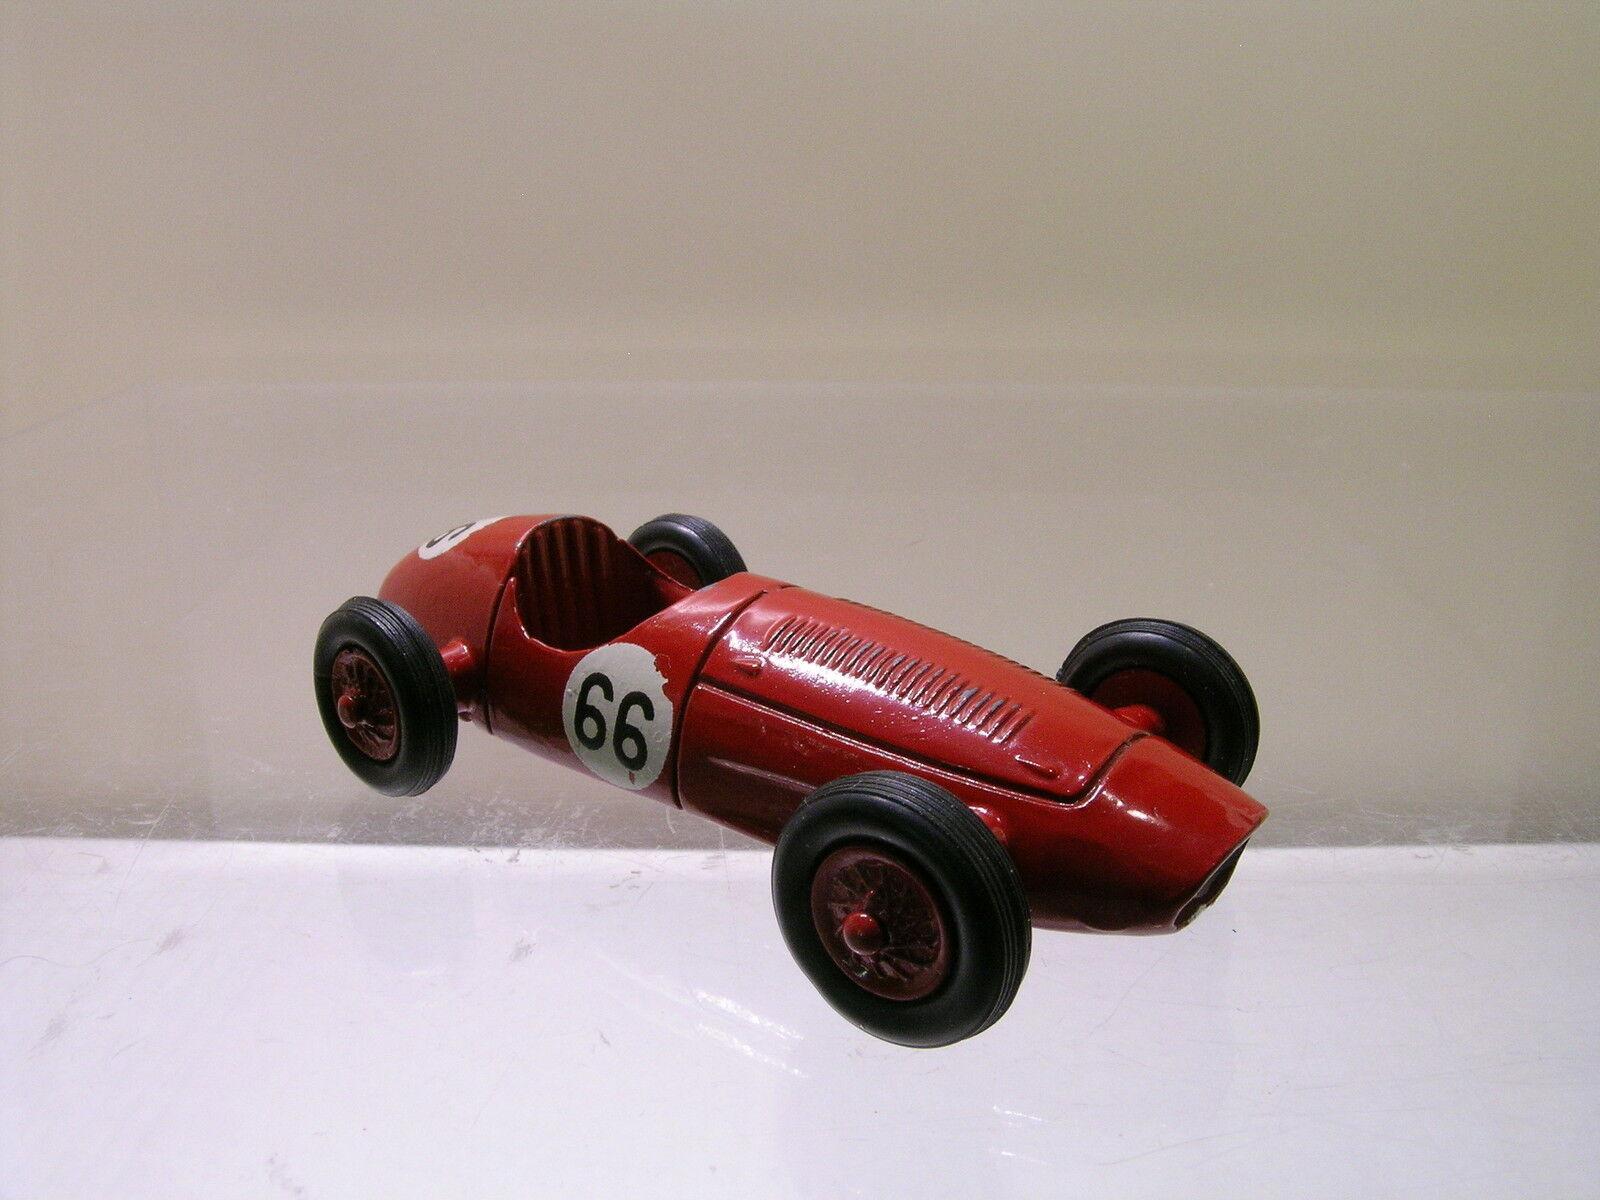 MERCURY ITALY 052 Jahr MASERATI  F1 F3000 RACER rot 66 SCALE 1 43